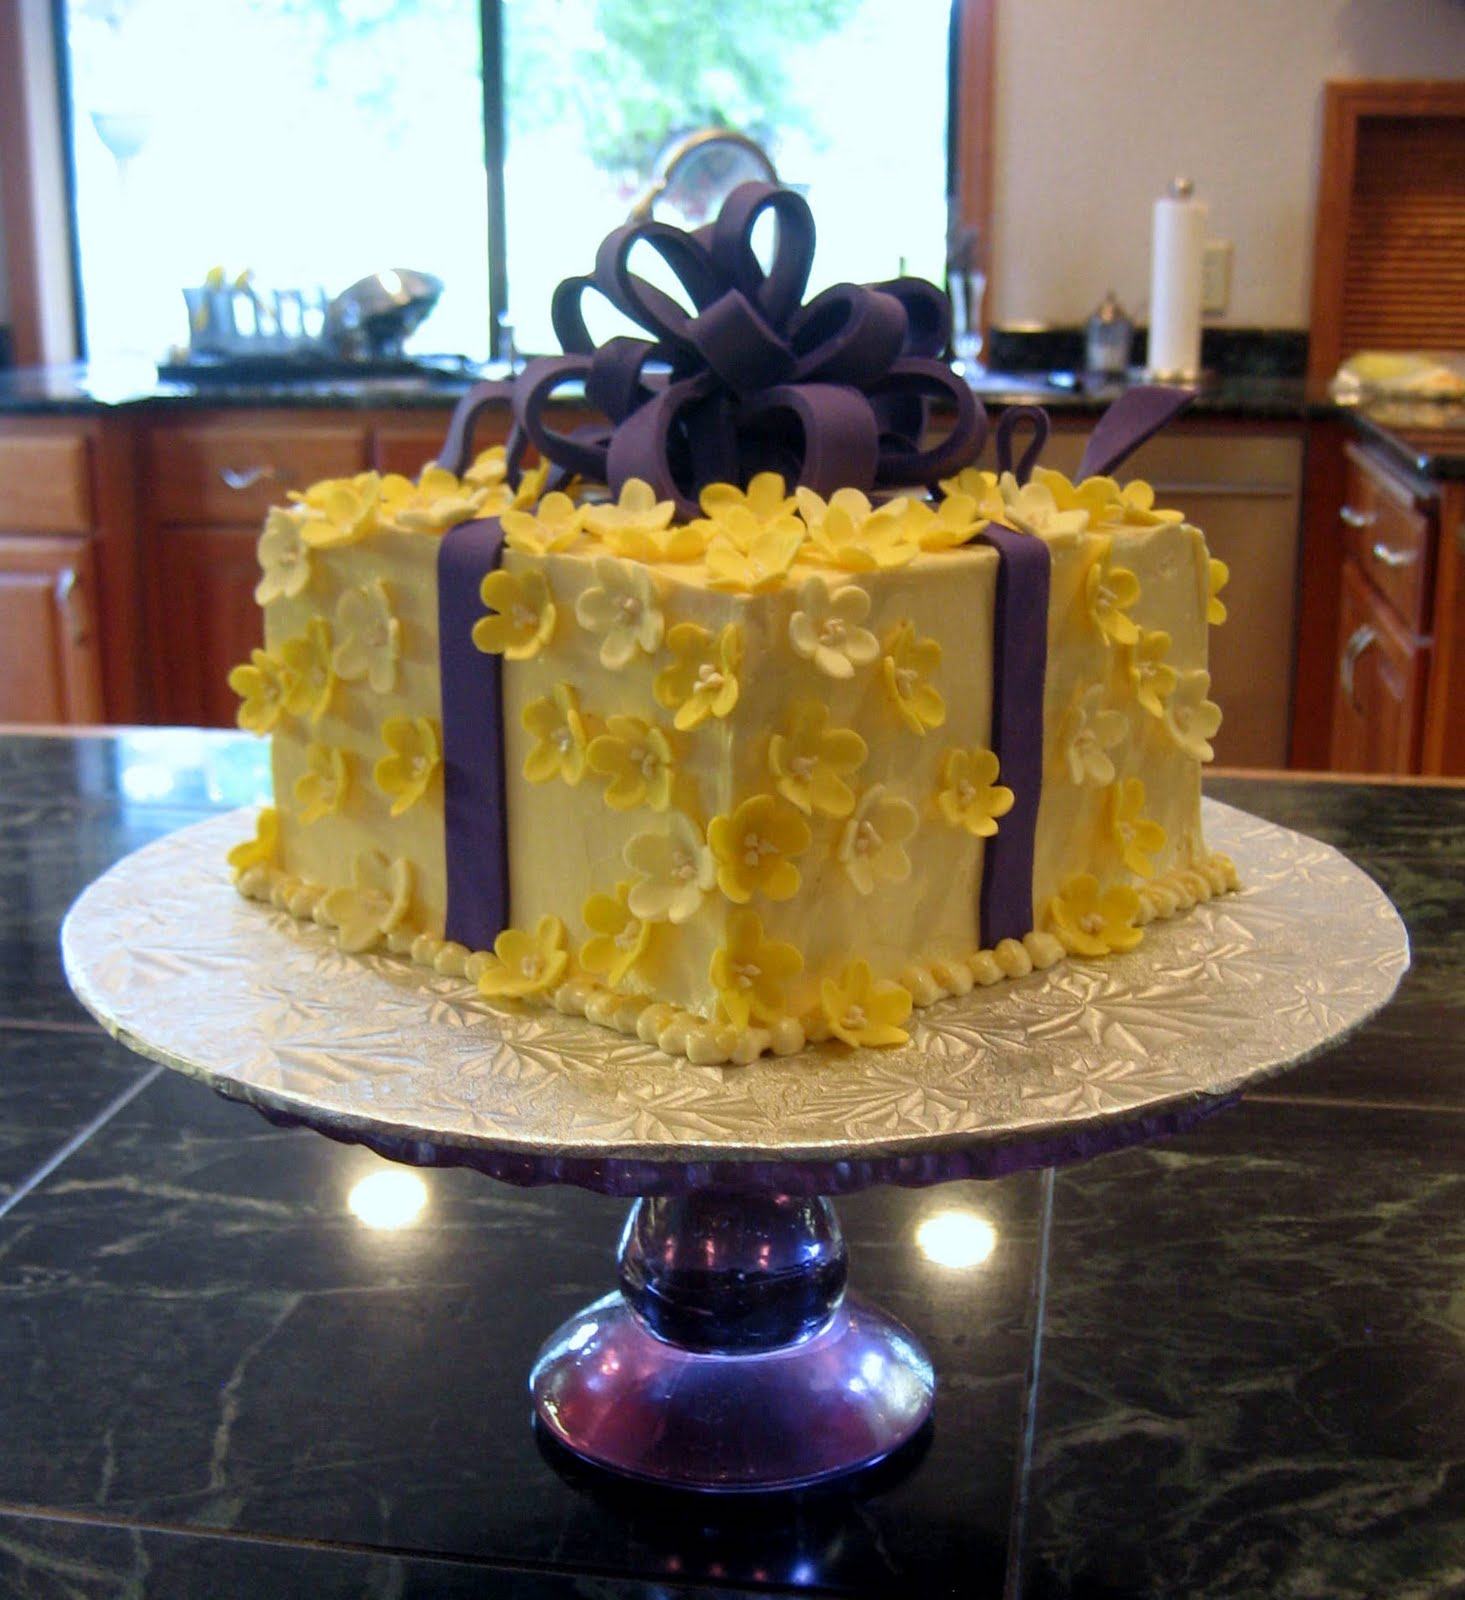 Jillicious Discoveries Three Purple Wedding Cakes: Jillicious Discoveries: Surprise Birthday Gift Cake (And